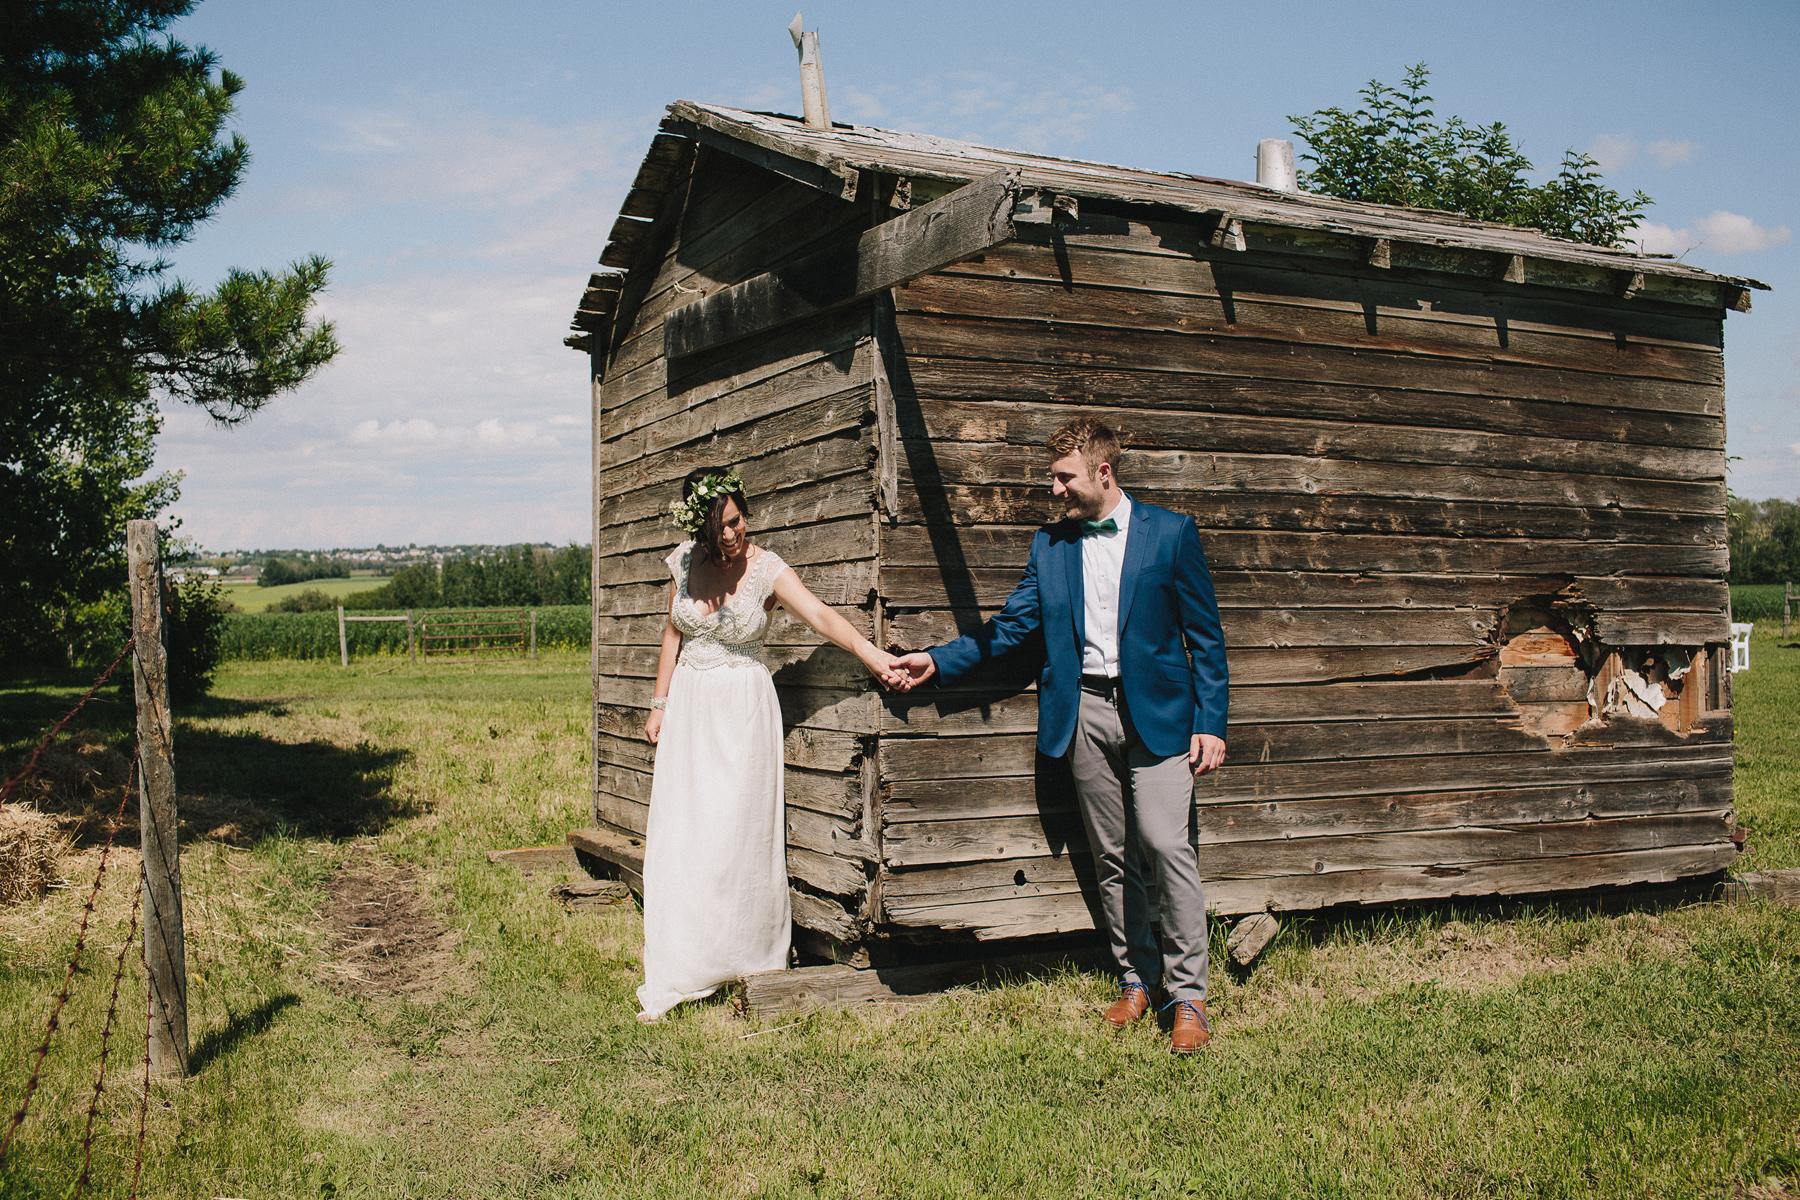 alberta-farm-wedding-photographer-rp-wj-045.jpg